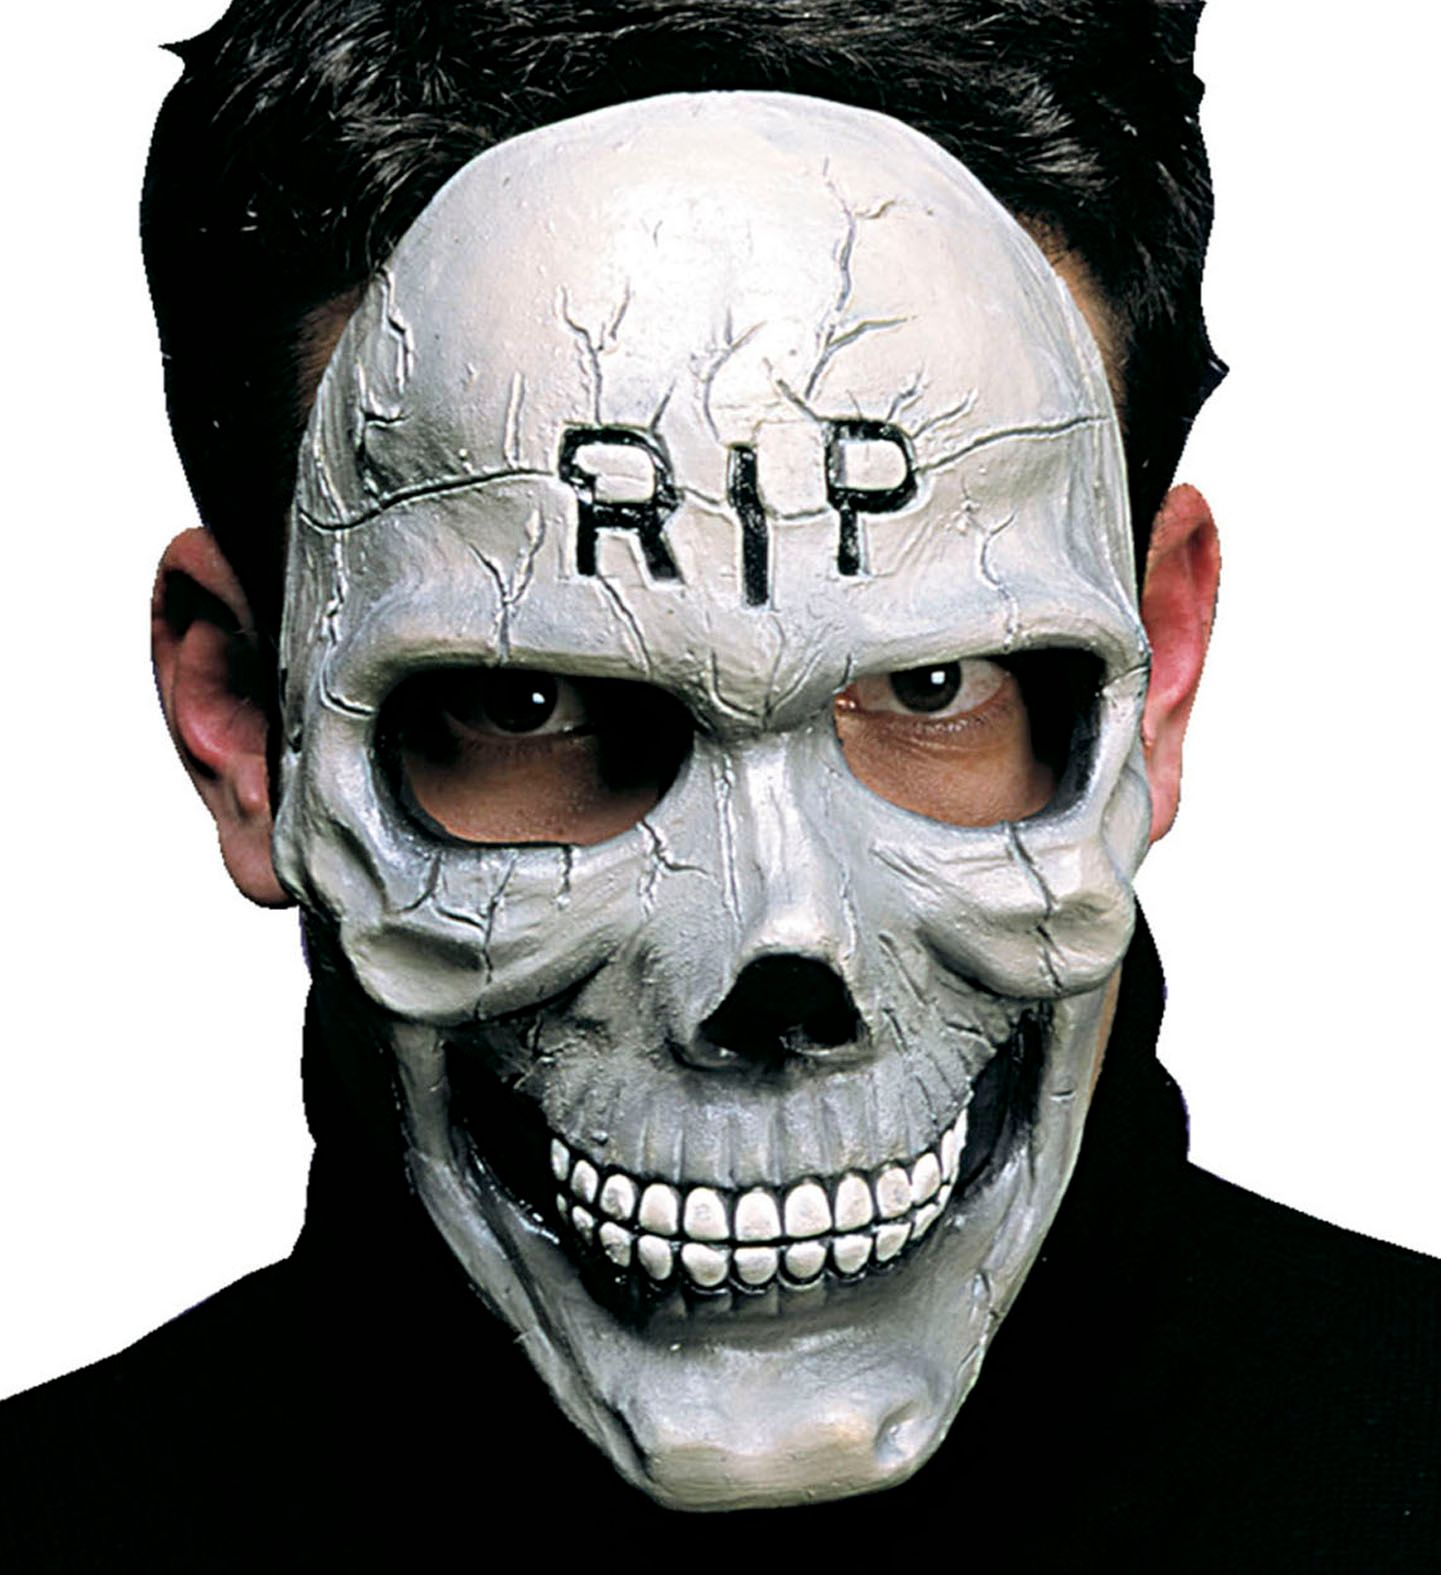 Rest In Peace schedel masker